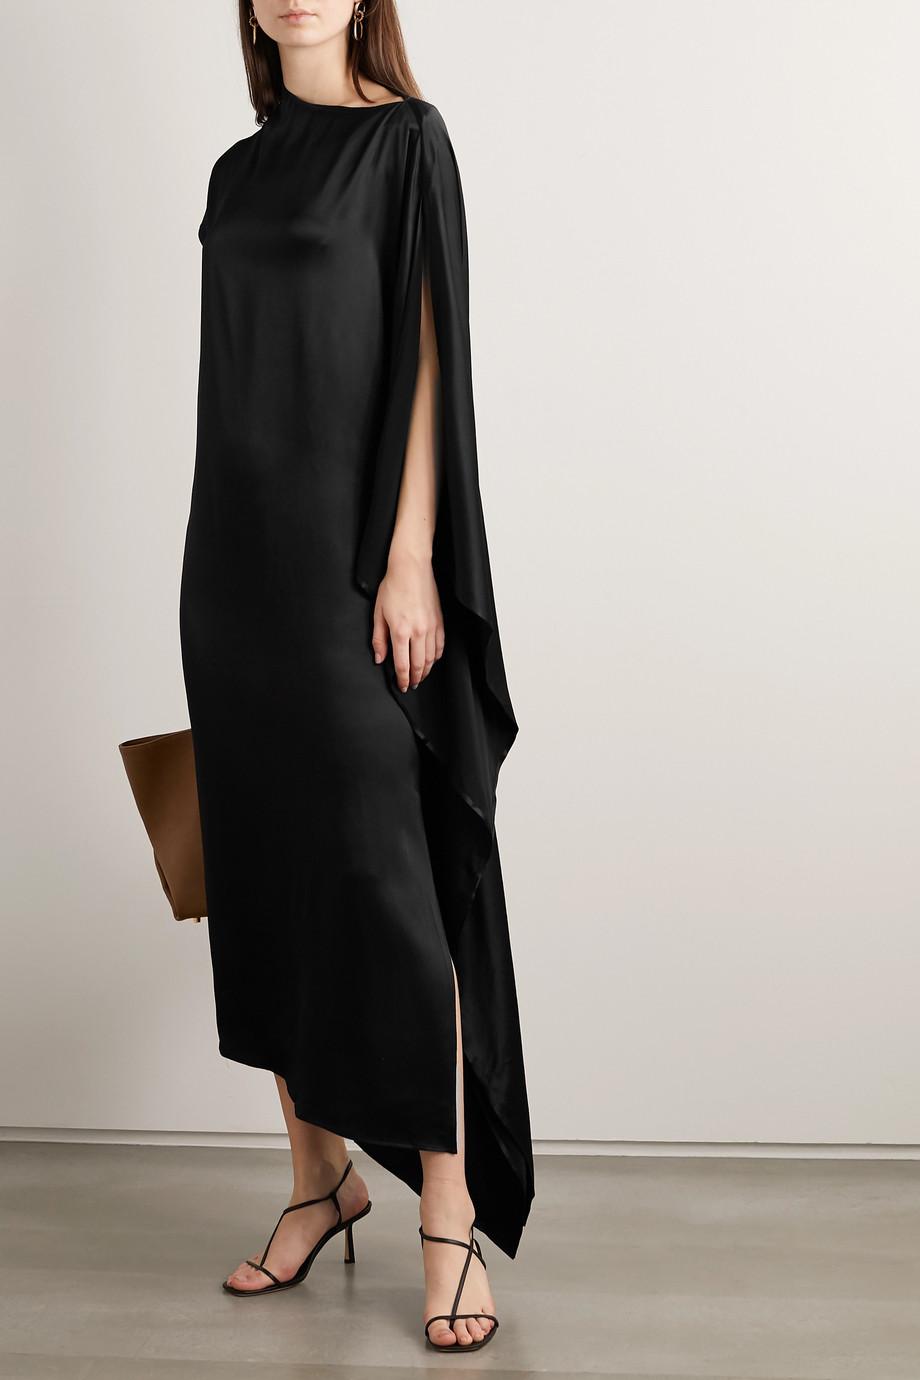 Envelope1976 + NET SUSTAIN Dali asymmetric satin maxi dress